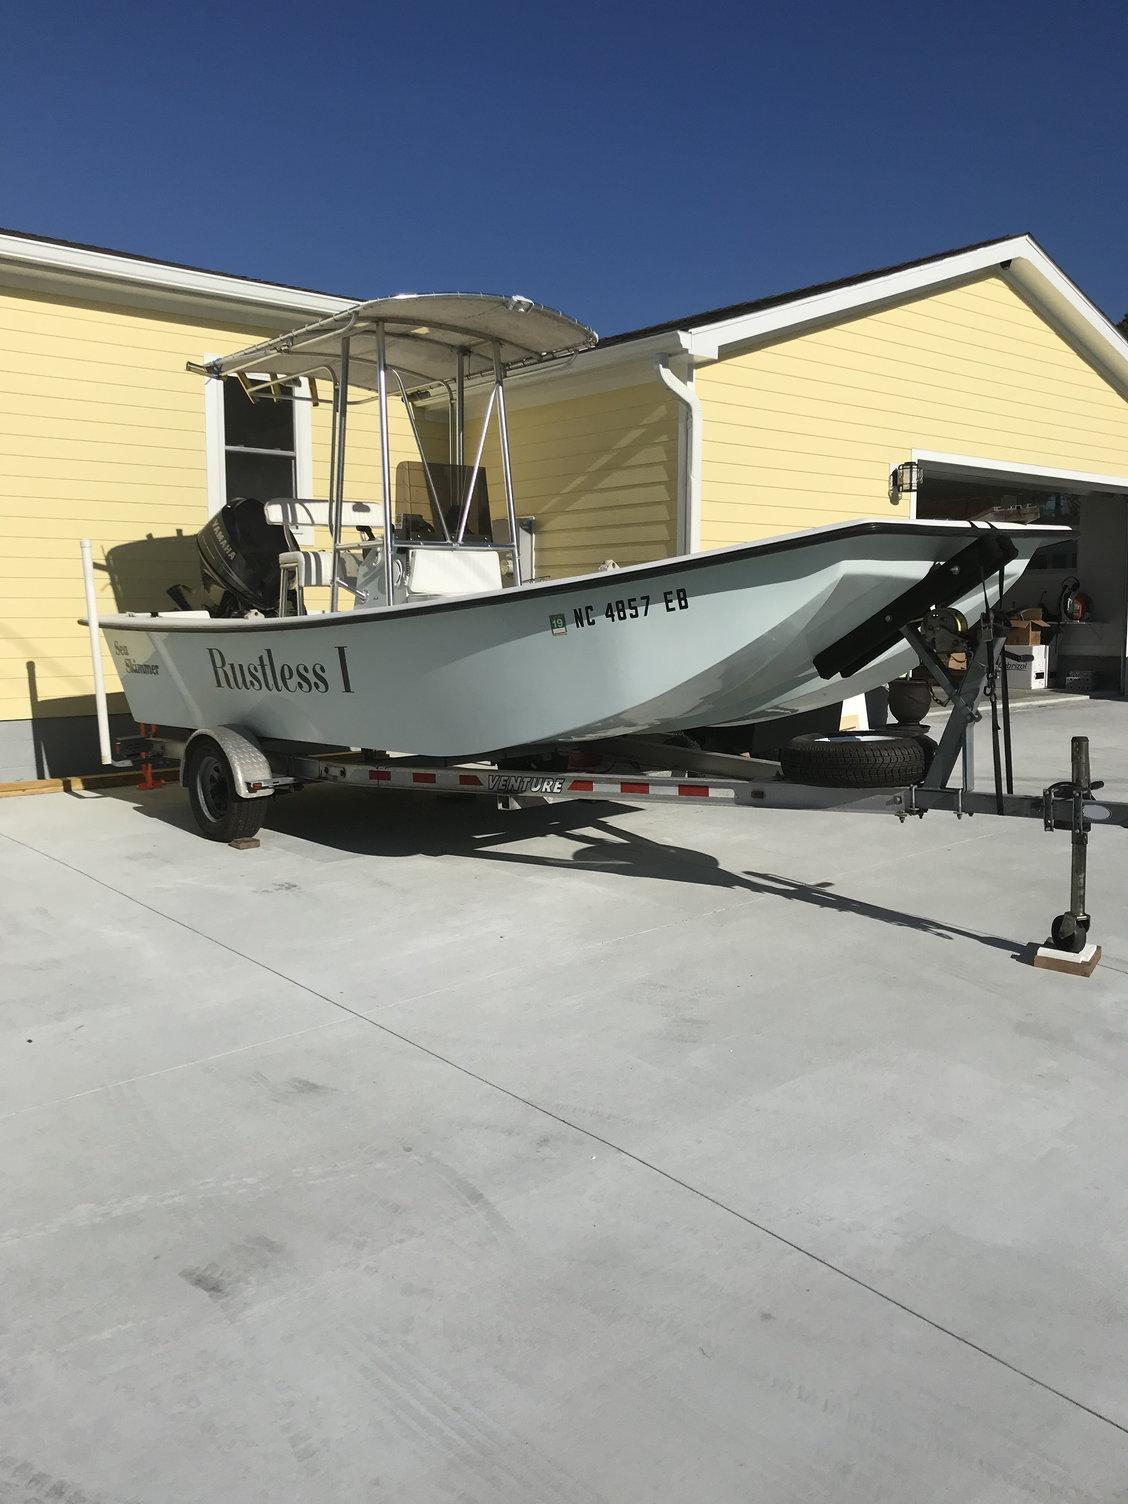 2008 Sea Skimmer Skiff $14,500 - The Hull Truth - Boating